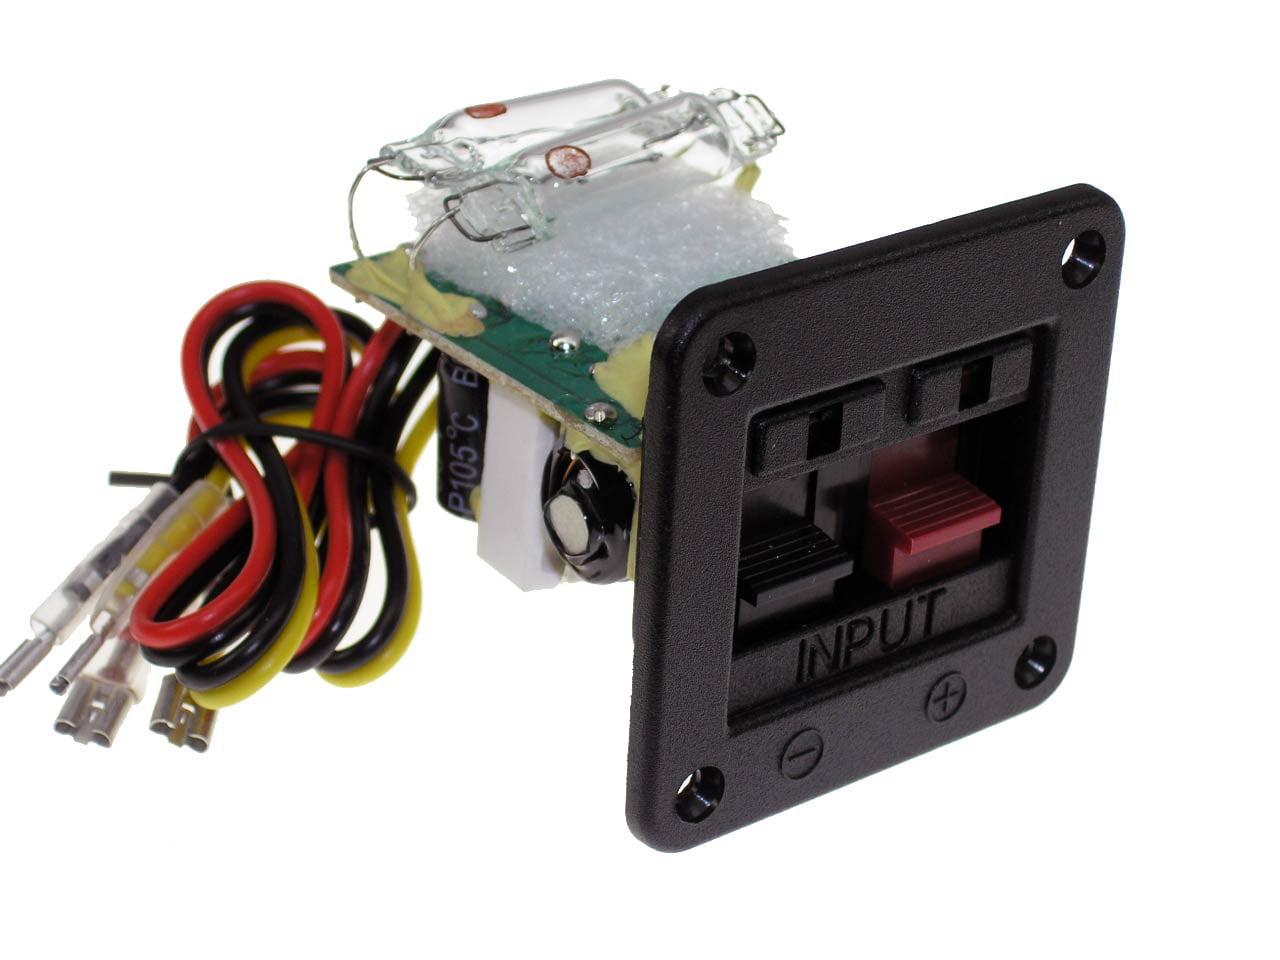 Jbl Control 28 Factory Speaker Replacement Crossover 129 20020 01 2007 Honda Xr650l Wiring Harness Diagram